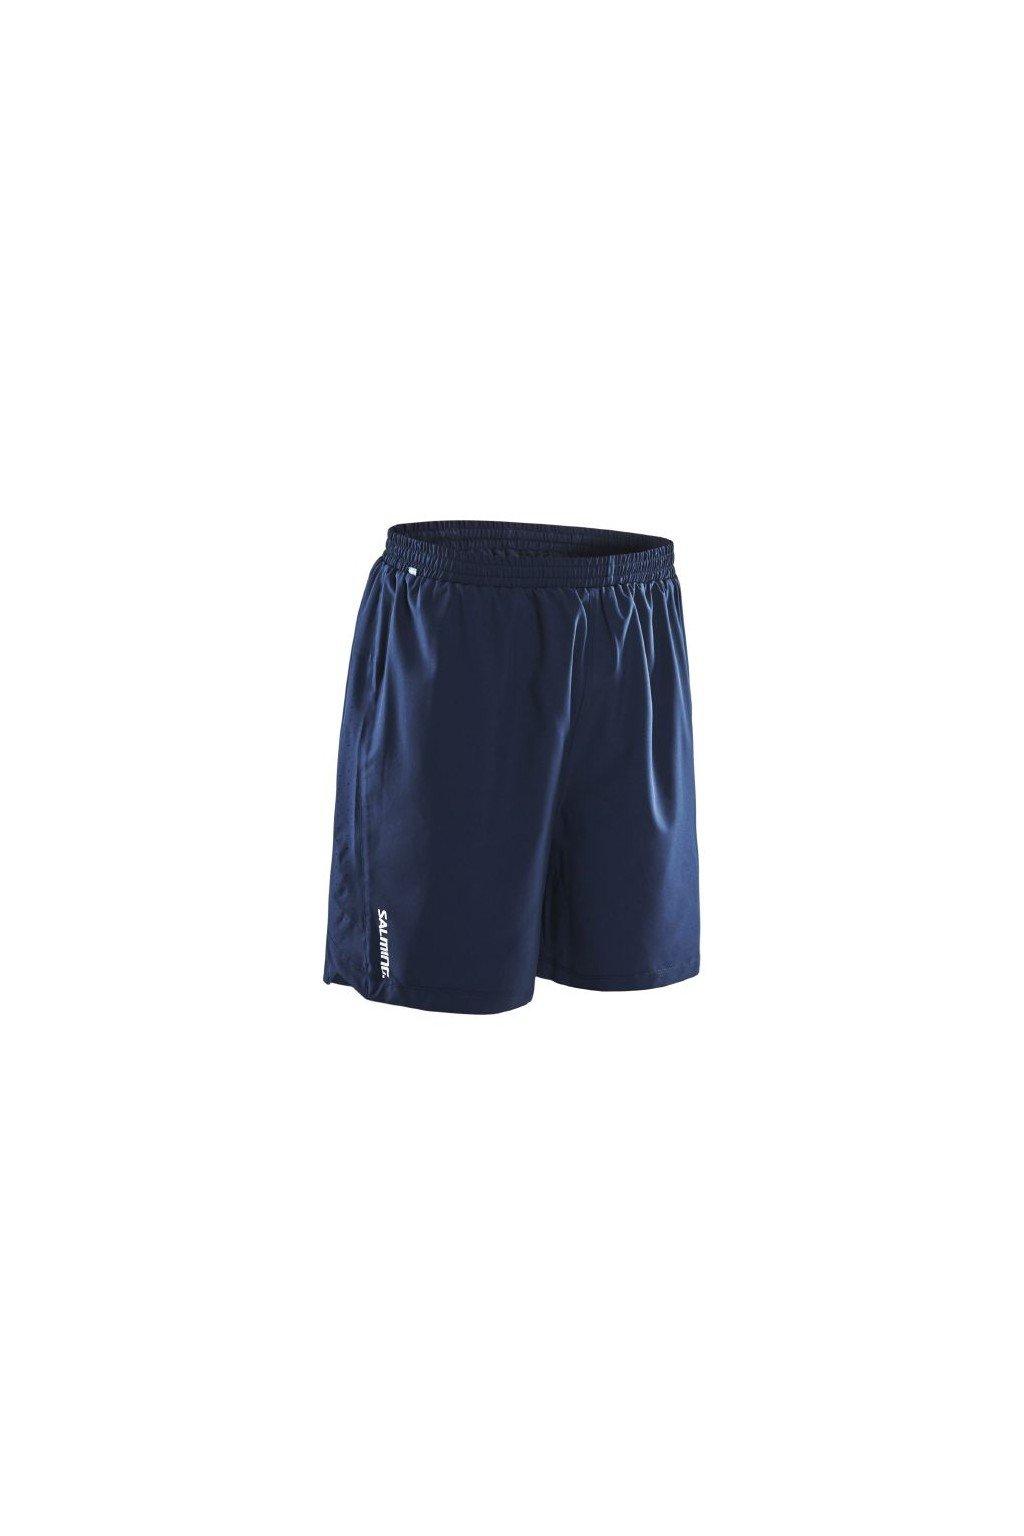 SALMING Air Shorts Navy Blue L